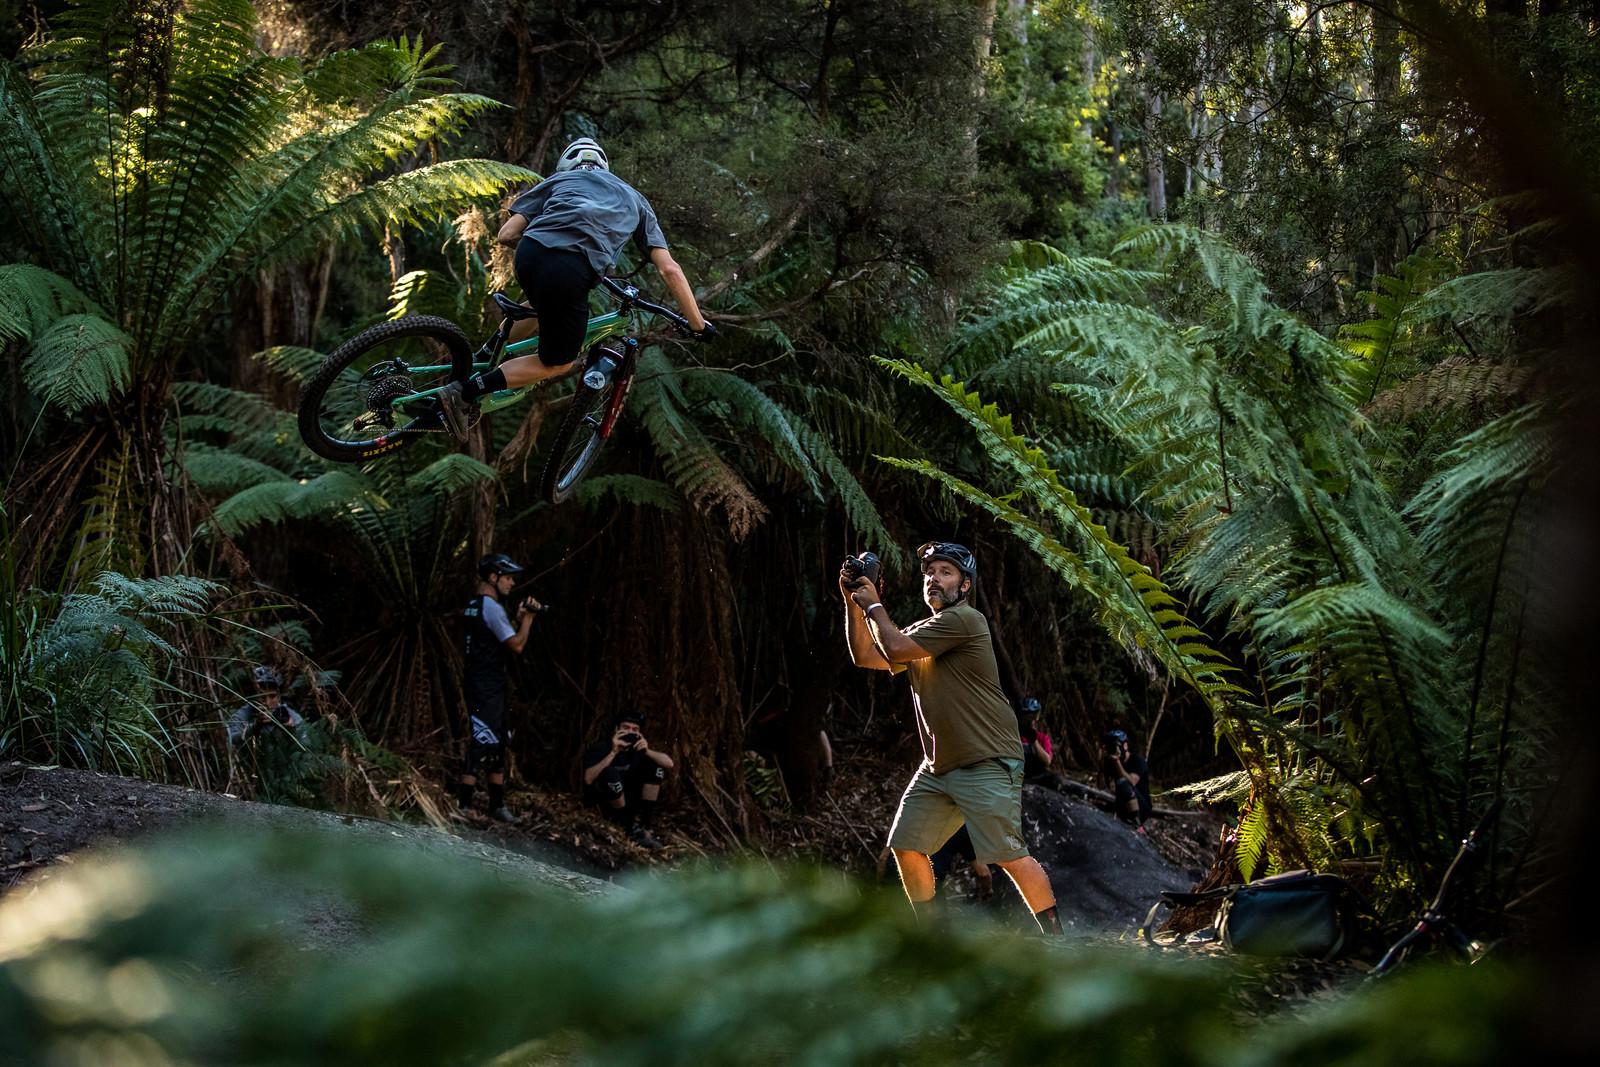 Sven is Easily Distracted - Officially Unsanctioned Enduro World Series Vertigo MTB / Moo Beer / Vital Whip-Off - Mountain Biking Pictures - Vital MTB